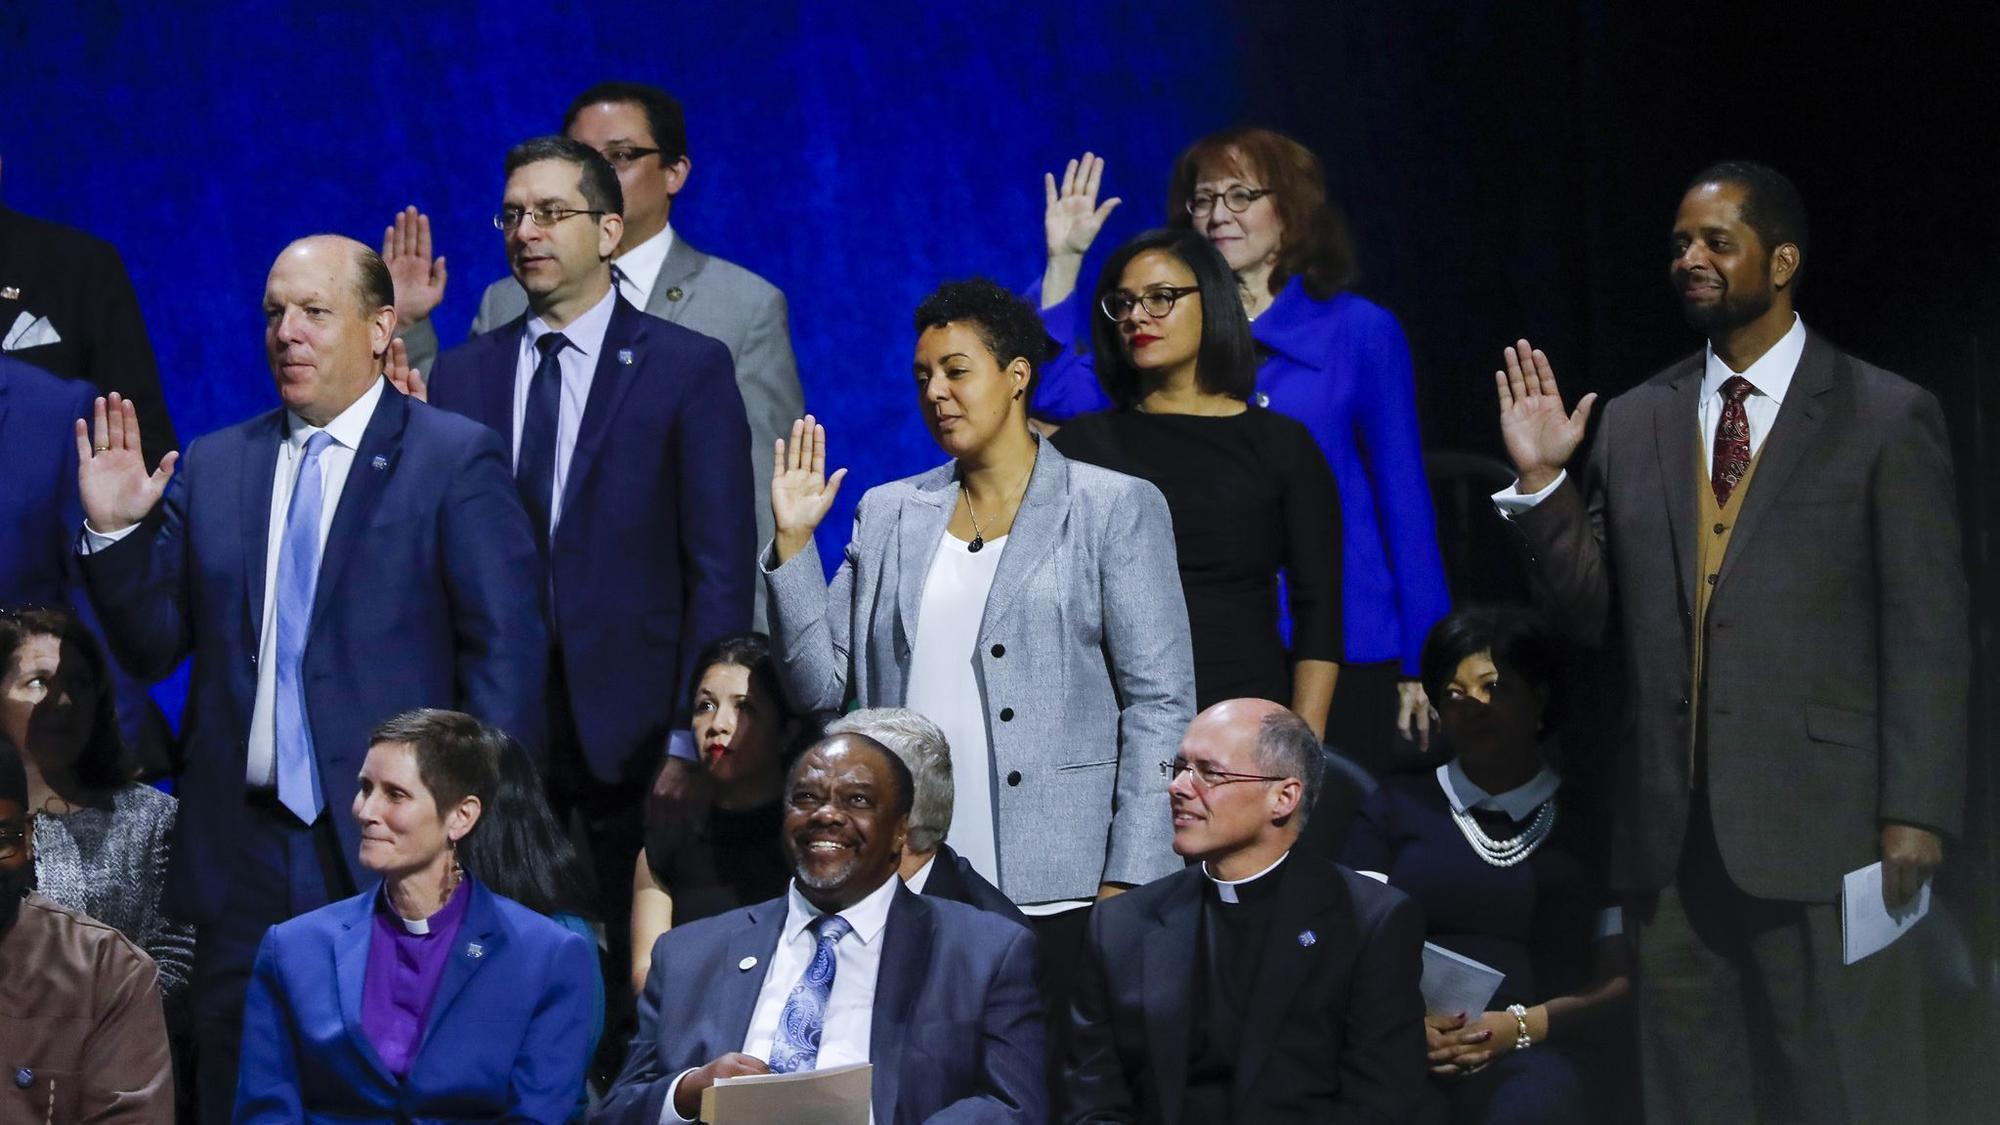 2a31c9b2db61 Chicago aldermen react to Mayor Lori Lightfoot s inaugural address ...